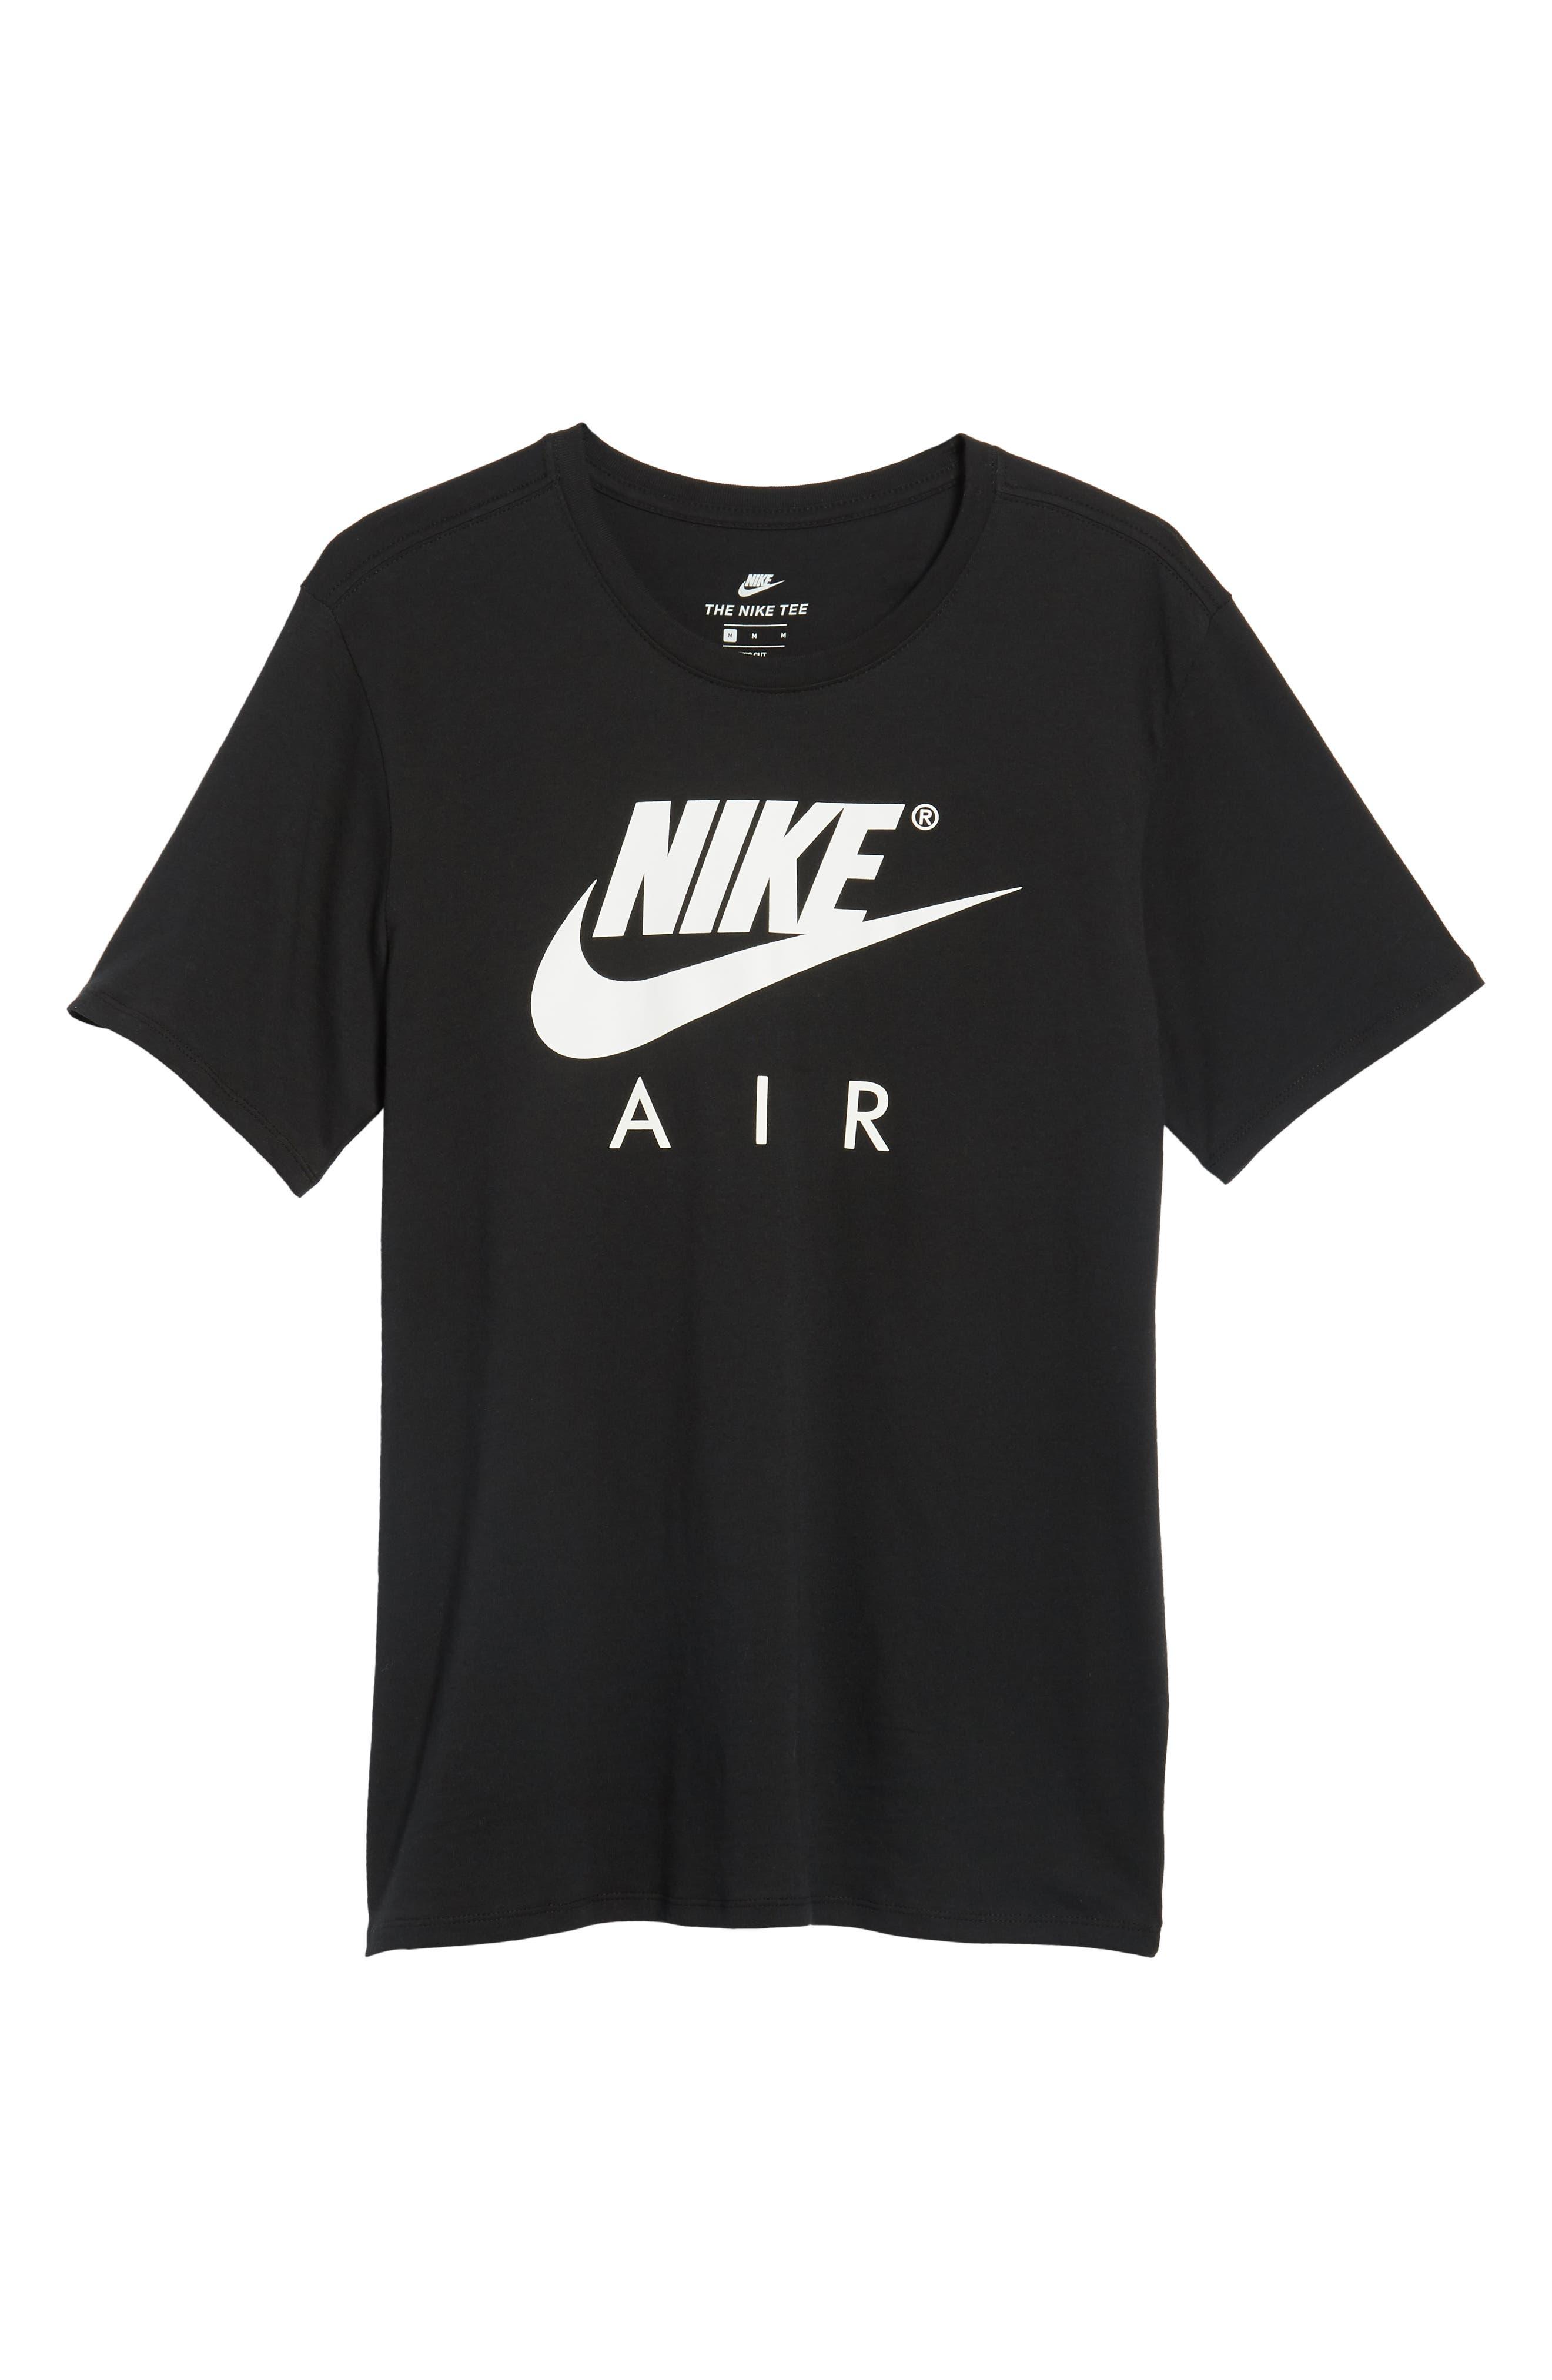 NSW Air 3 Crewneck T-Shirt,                             Alternate thumbnail 6, color,                             BLACK/ WHITE